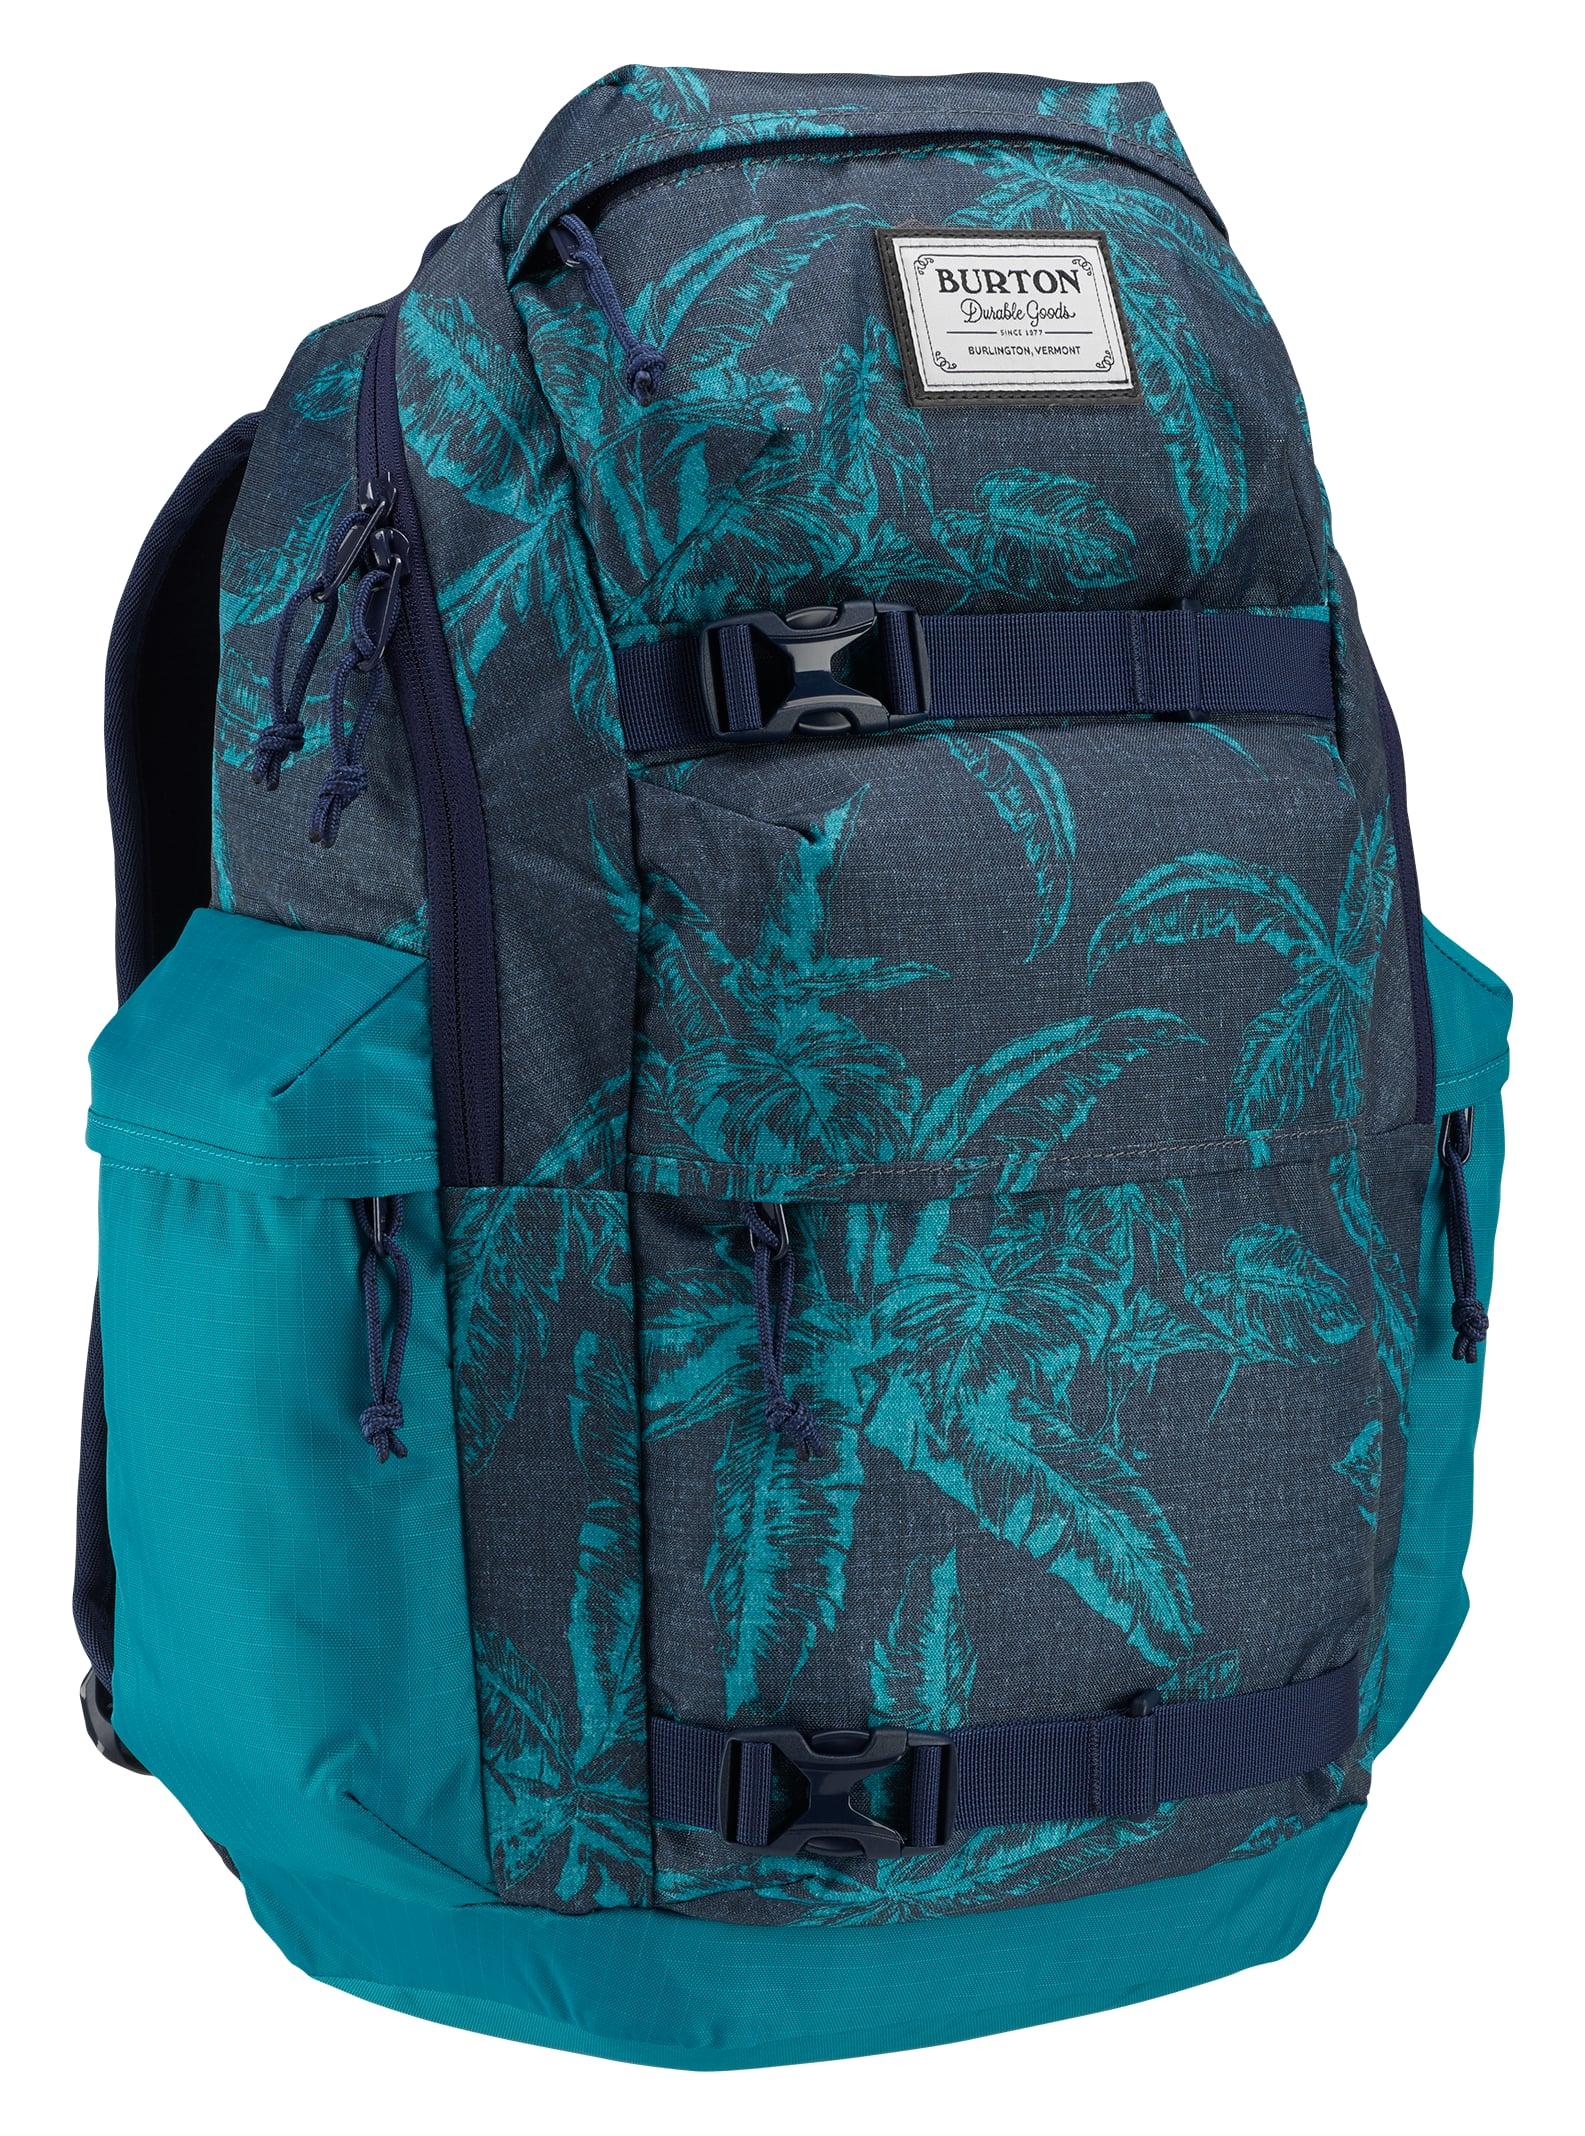 467743f941 Burton Kilo Backpack | Burton Snowboards Spring 2017